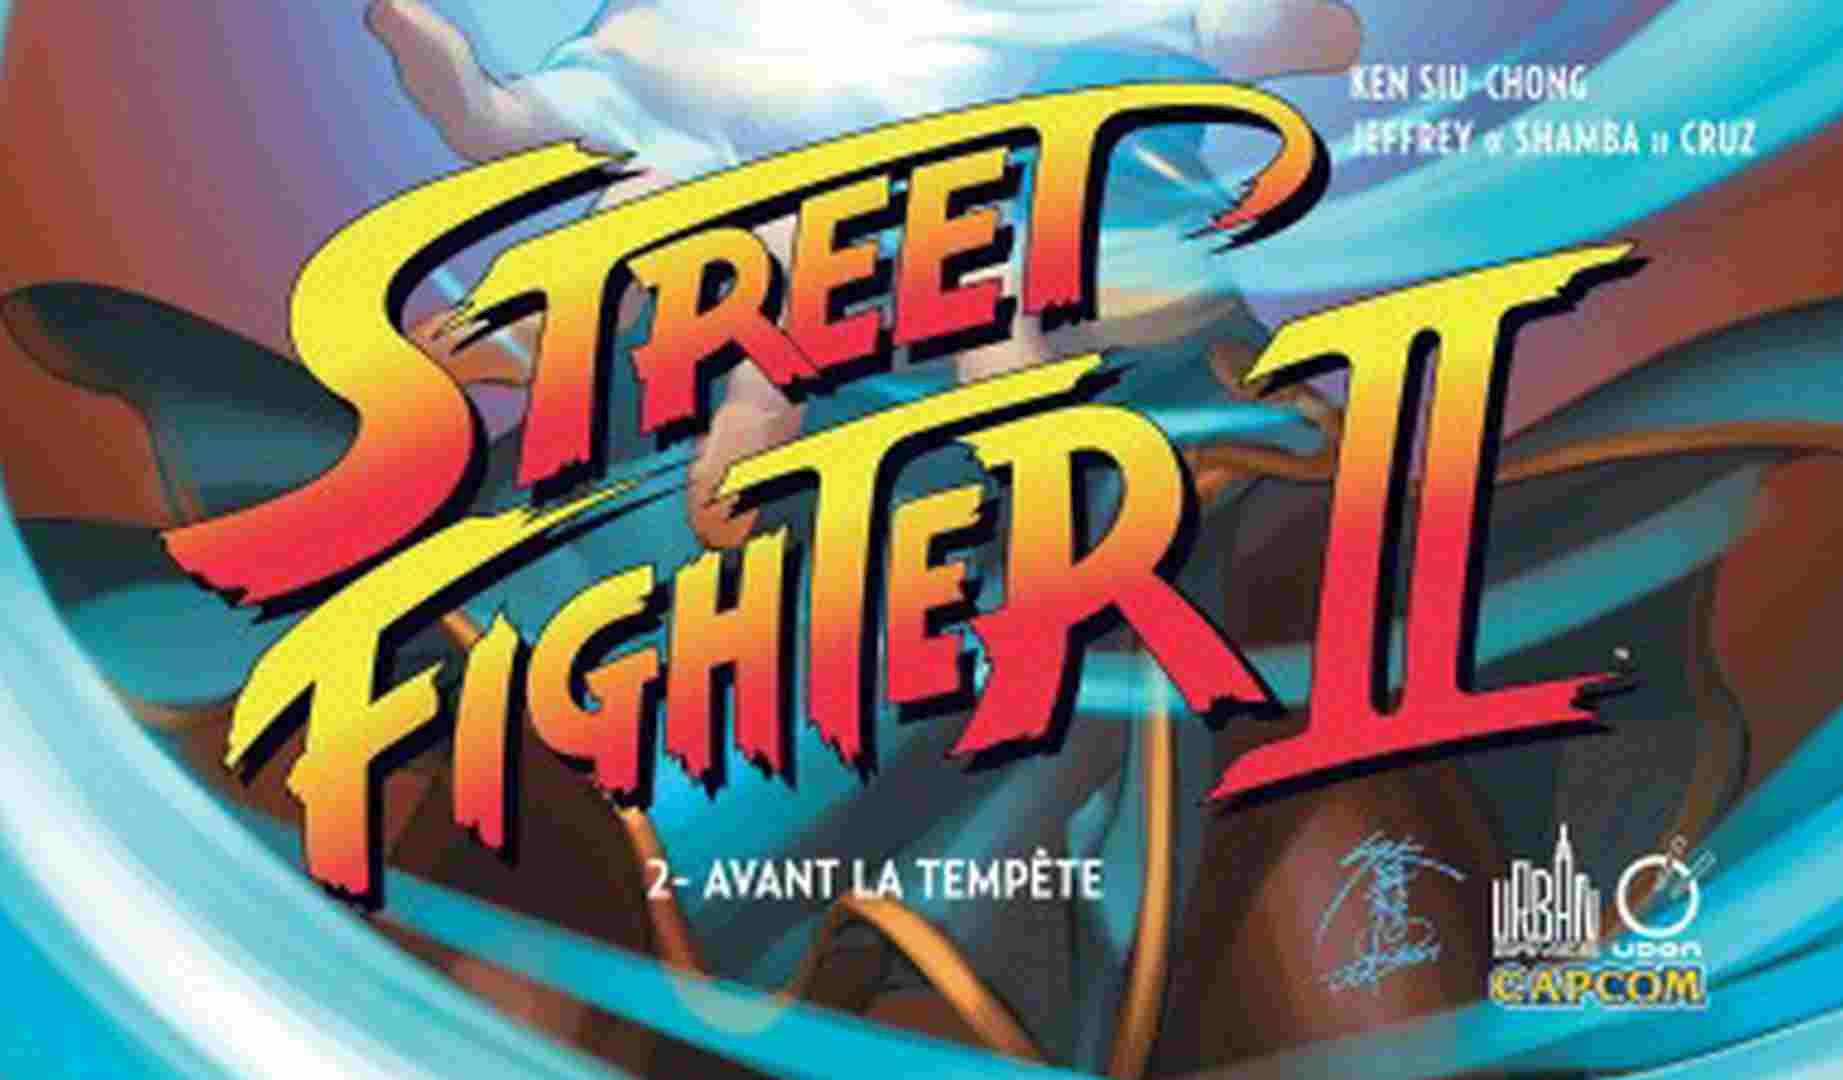 Comics Street Fighter II Tome 2